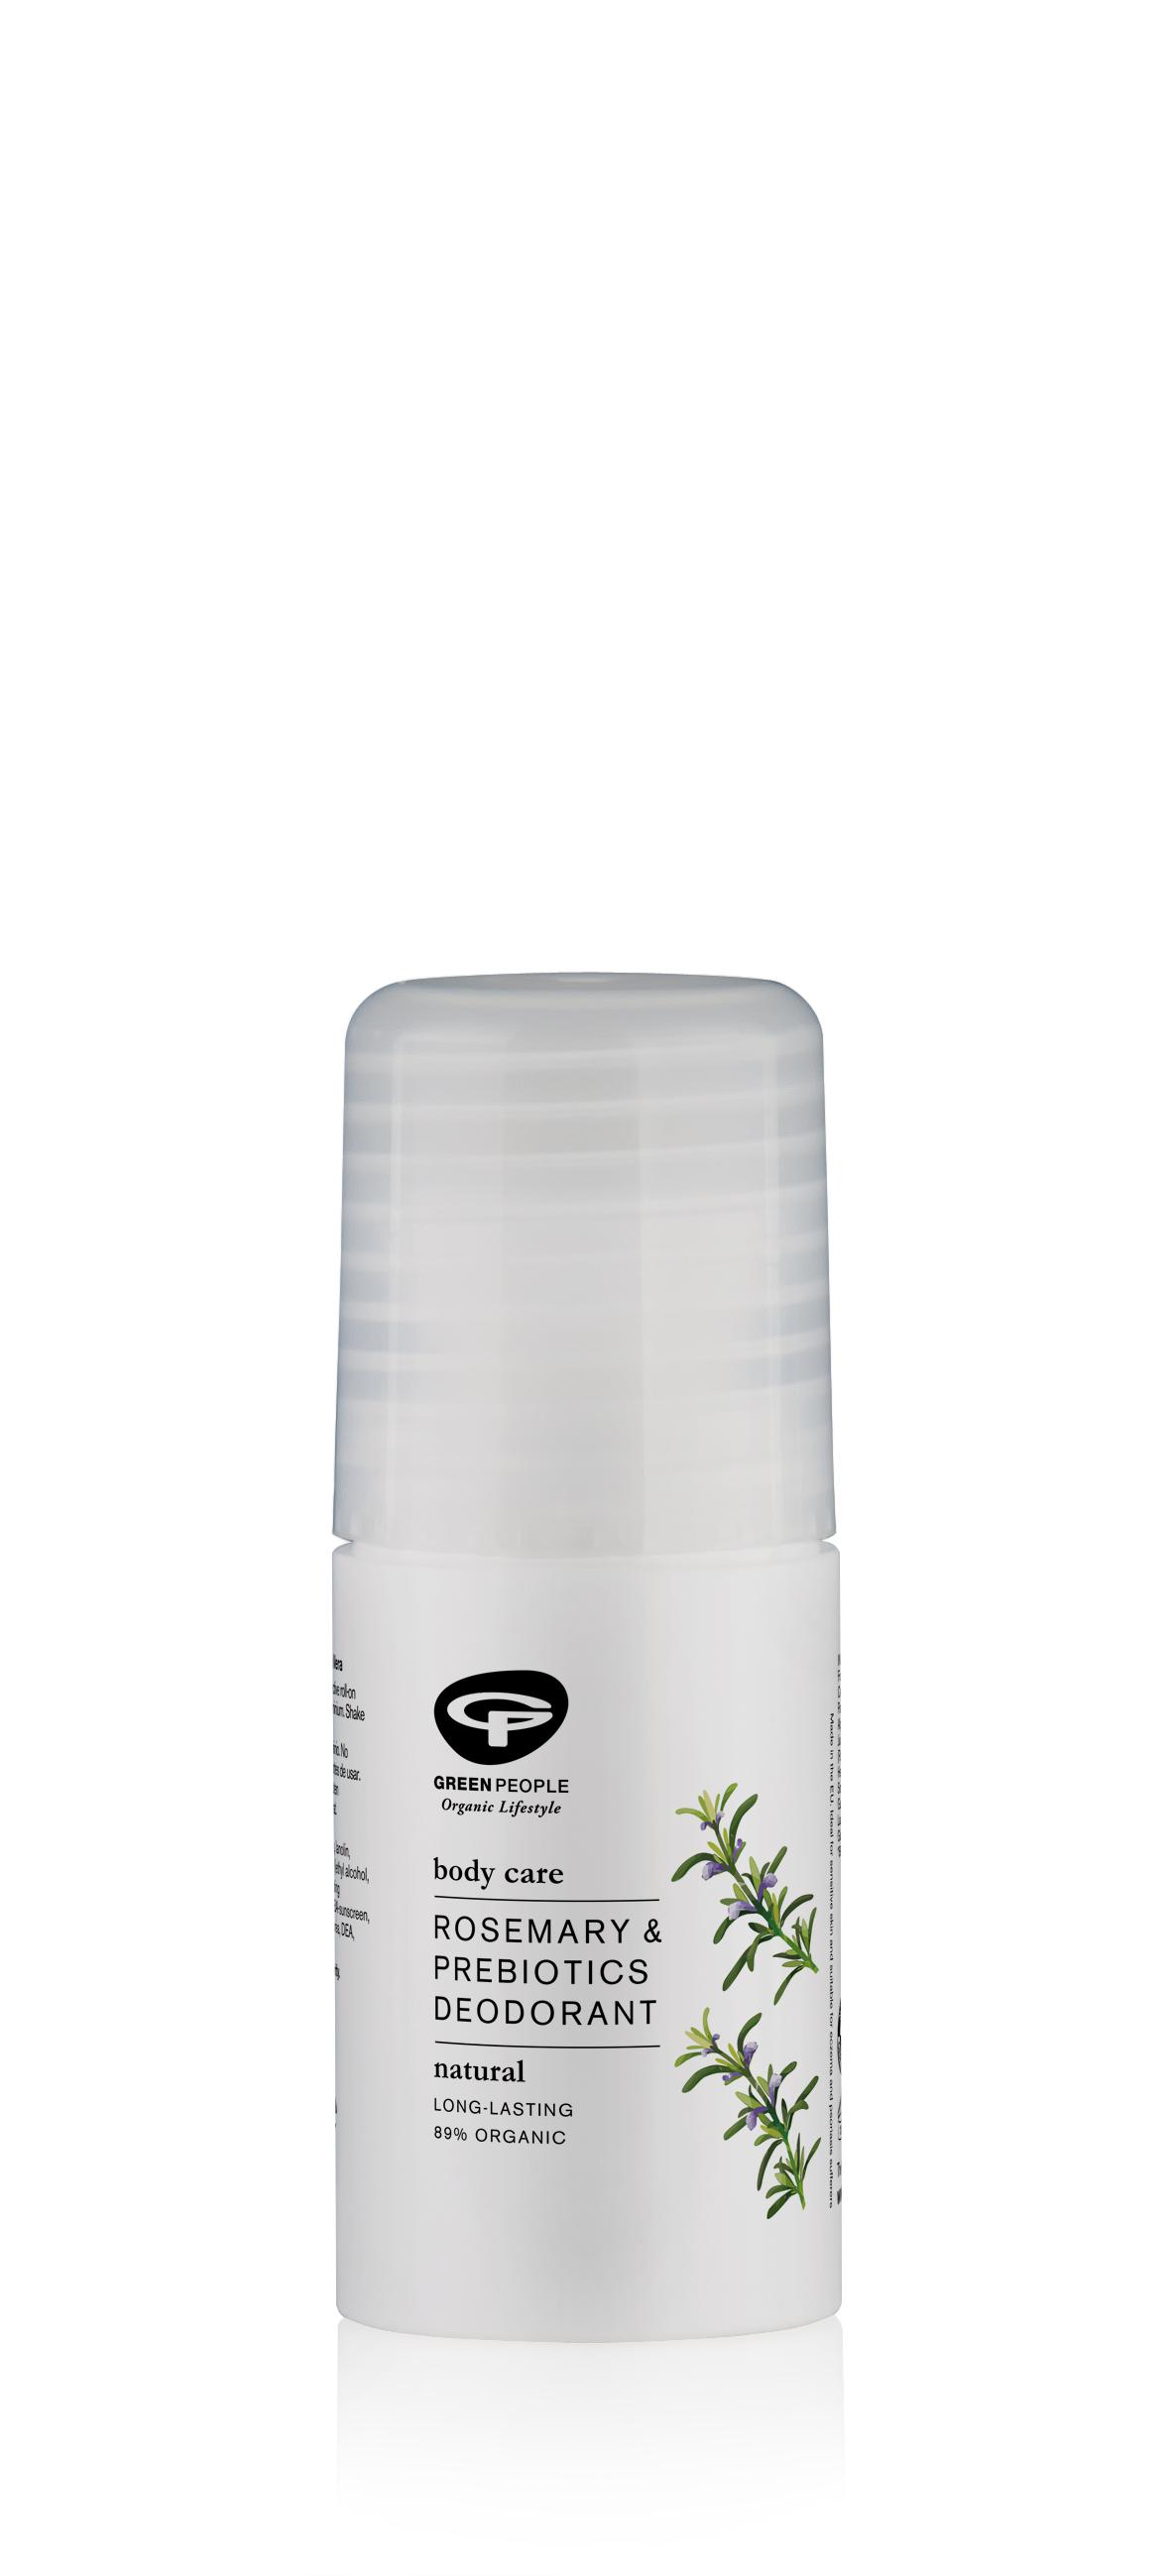 Rosemary & Prebiotics Deodorant  75ml